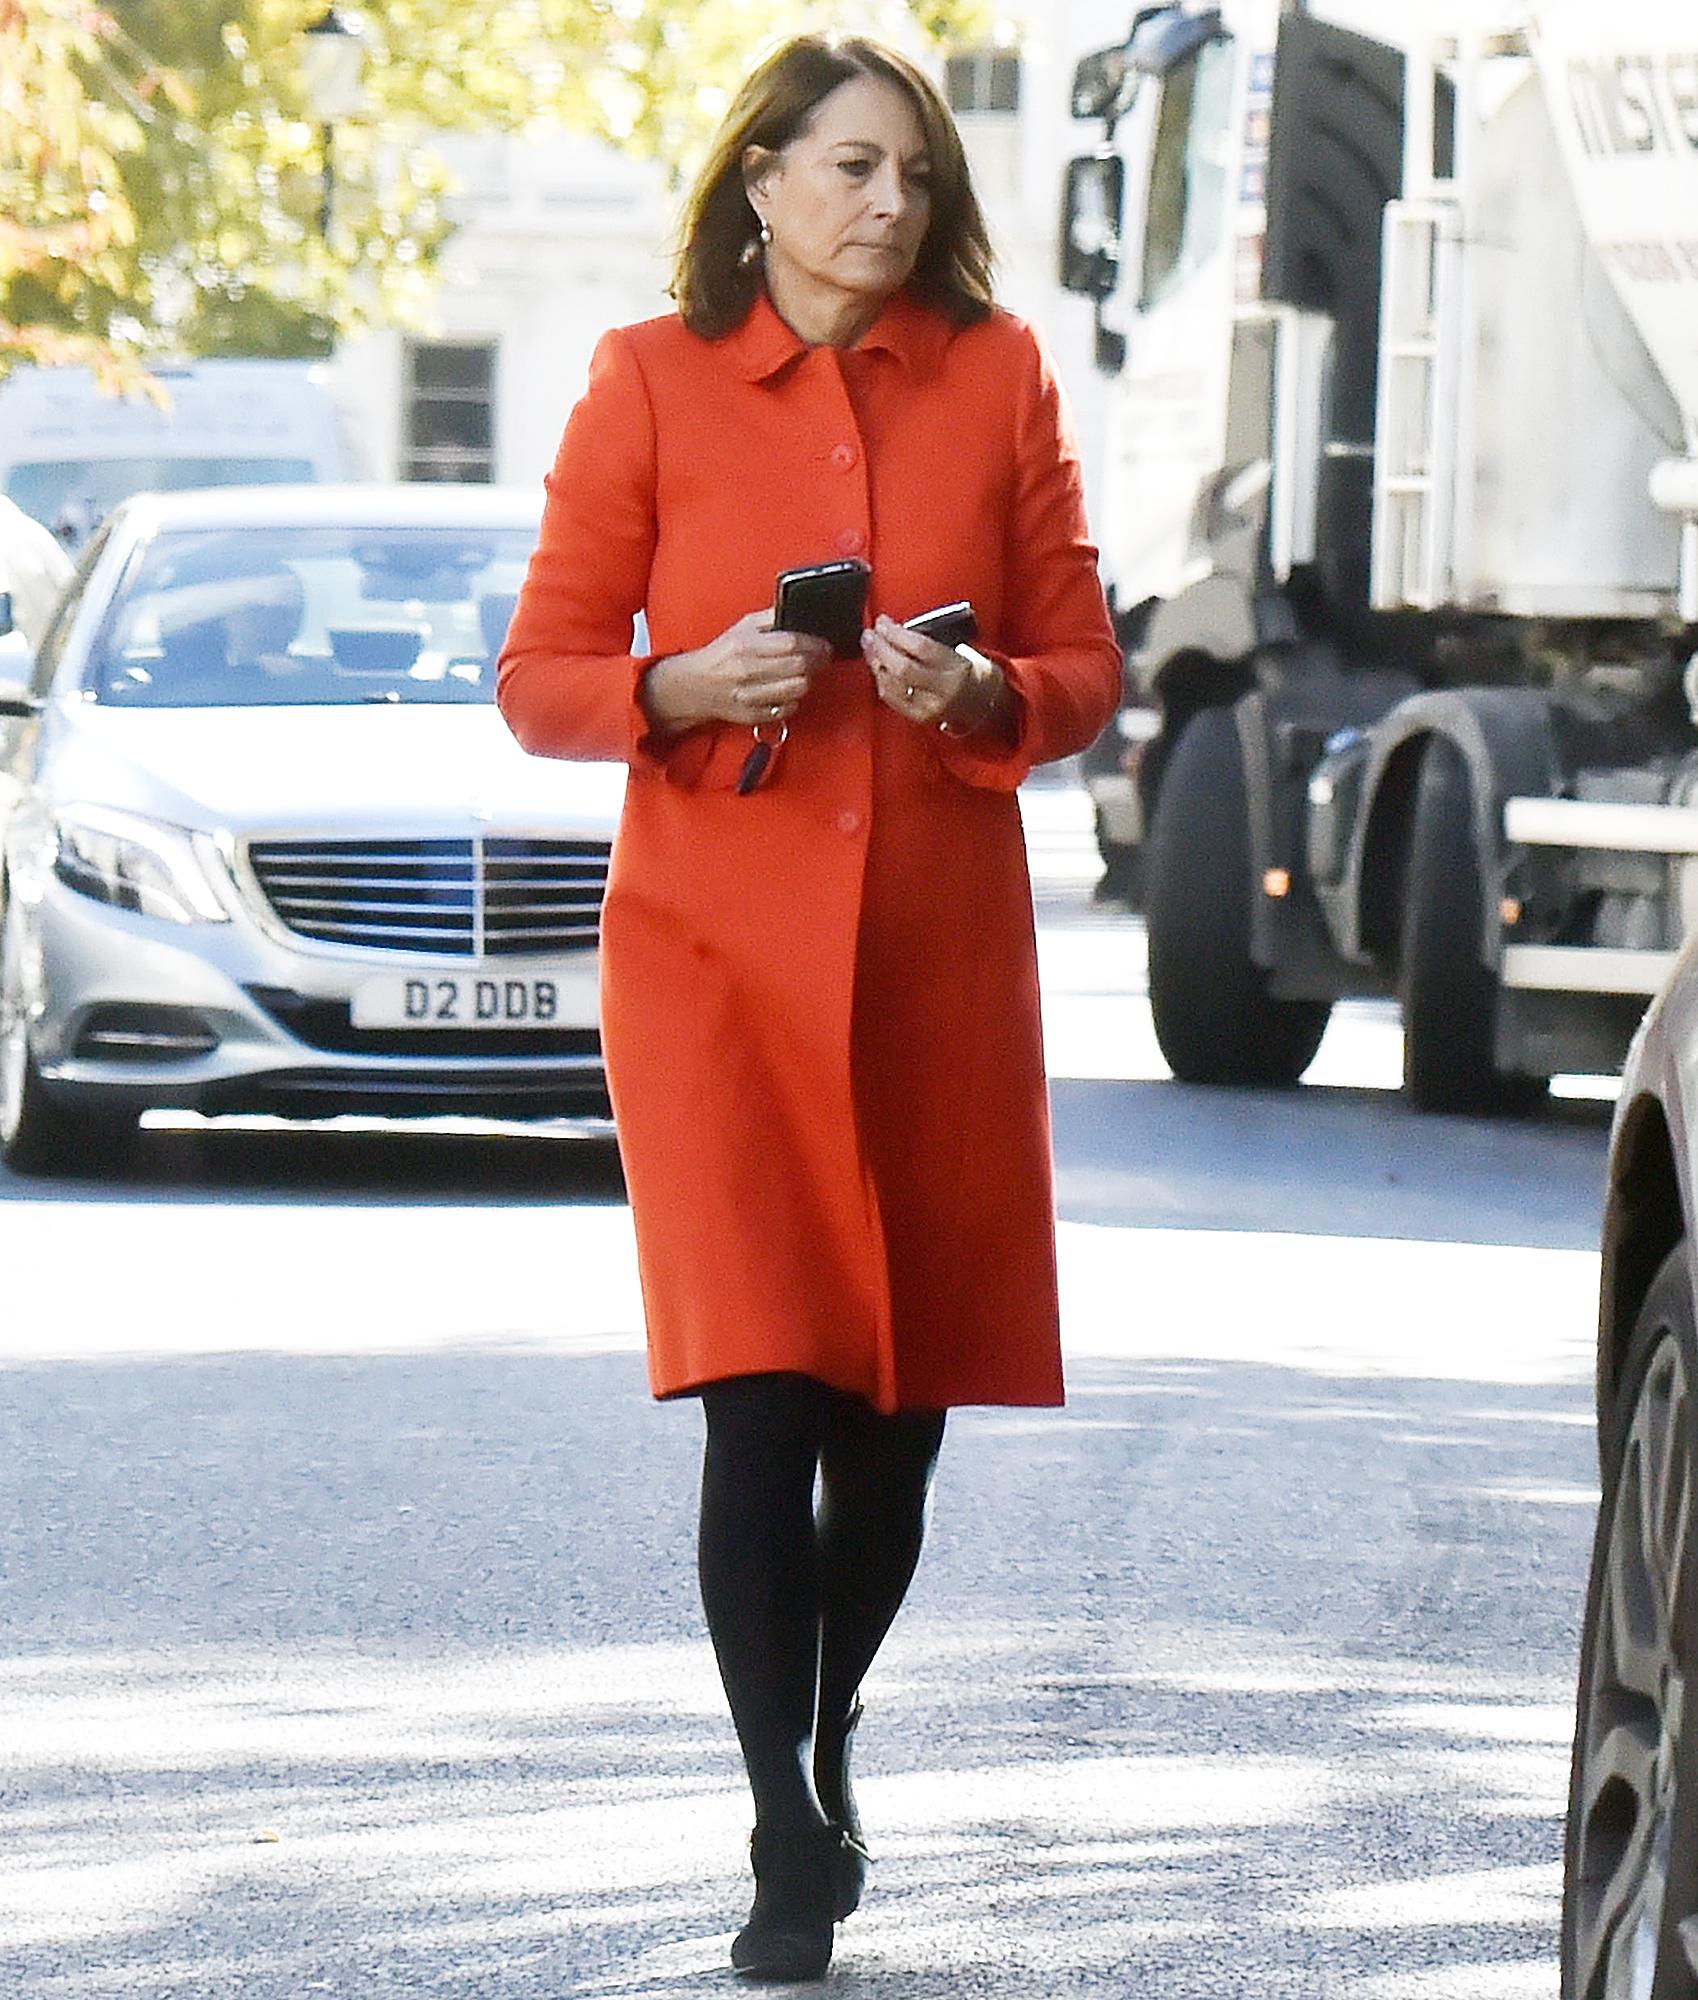 Carole Middleton Visits Pippa Middleton After Baby